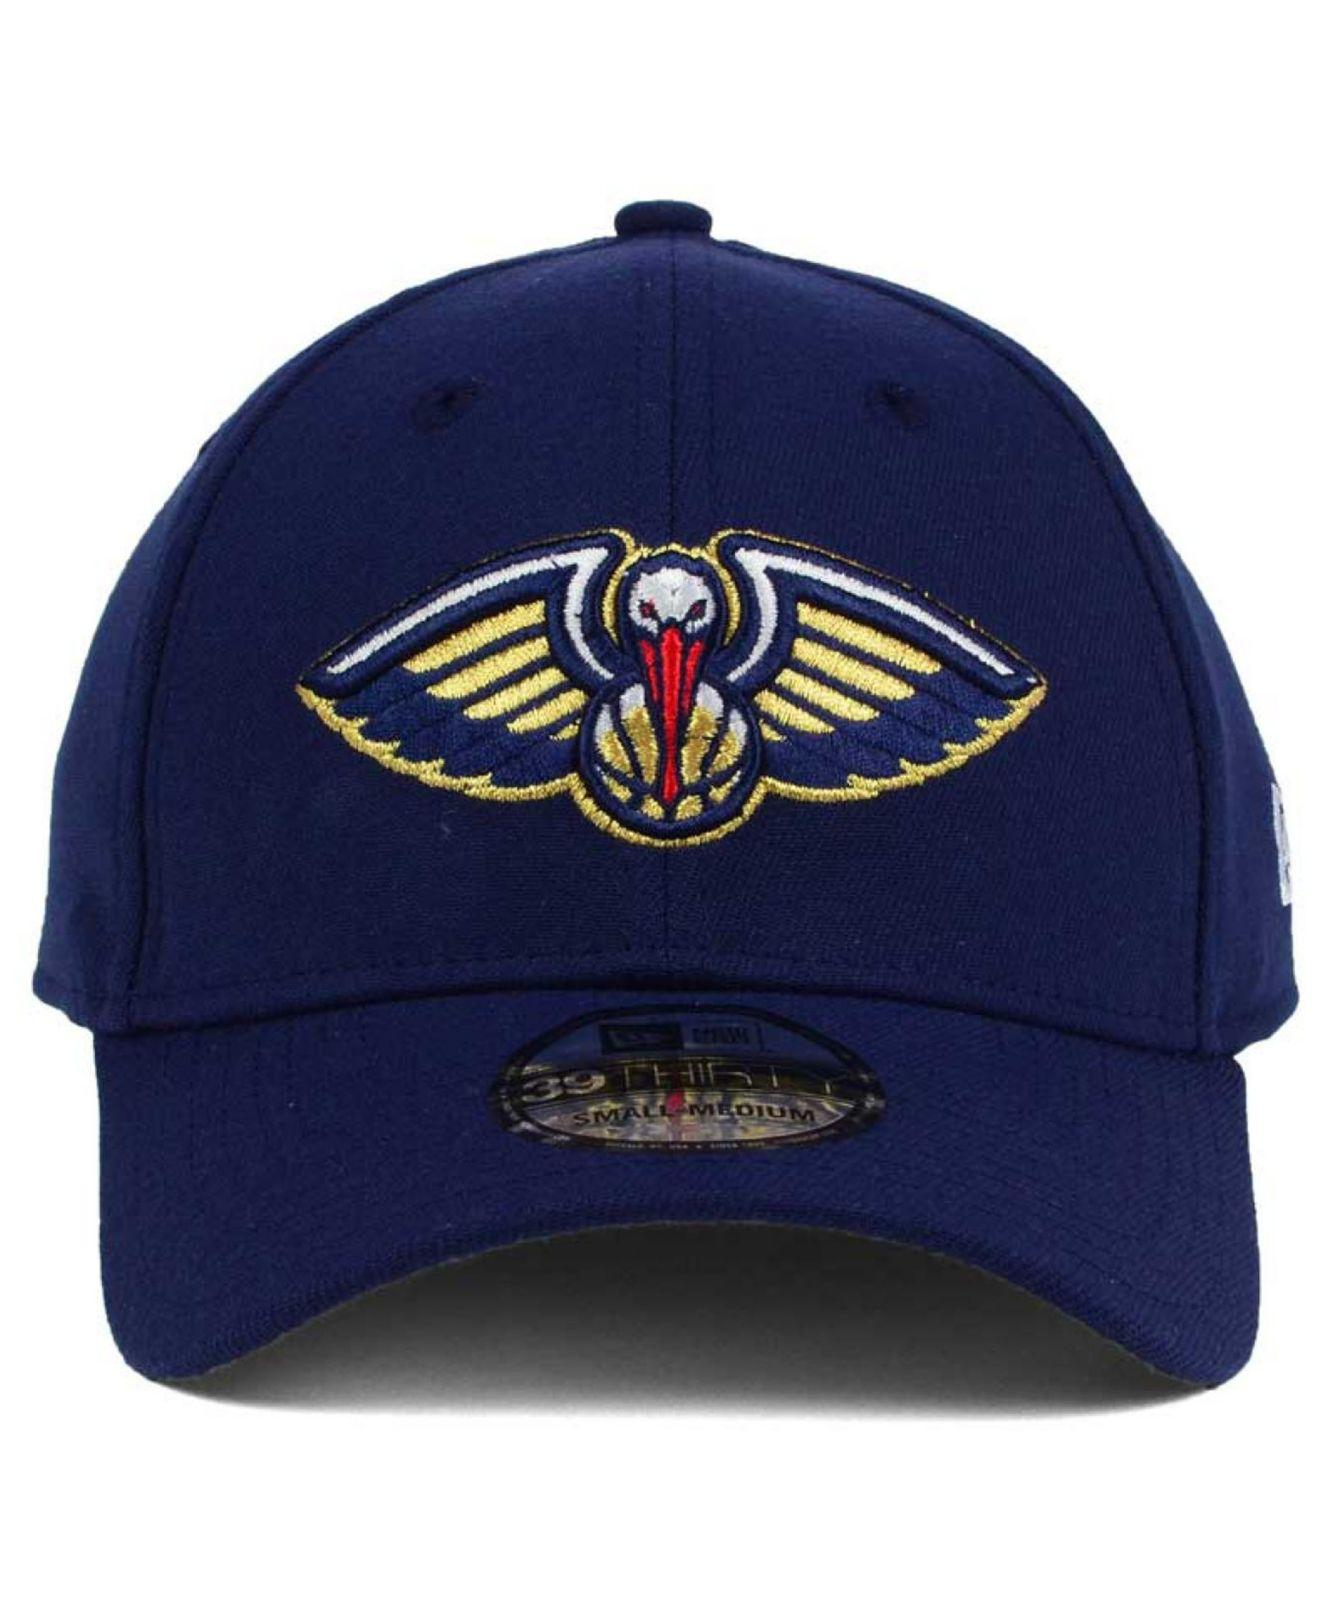 f65b9866e4b Lyst - Ktz Team Classic 39thirty Cap in Blue for Men